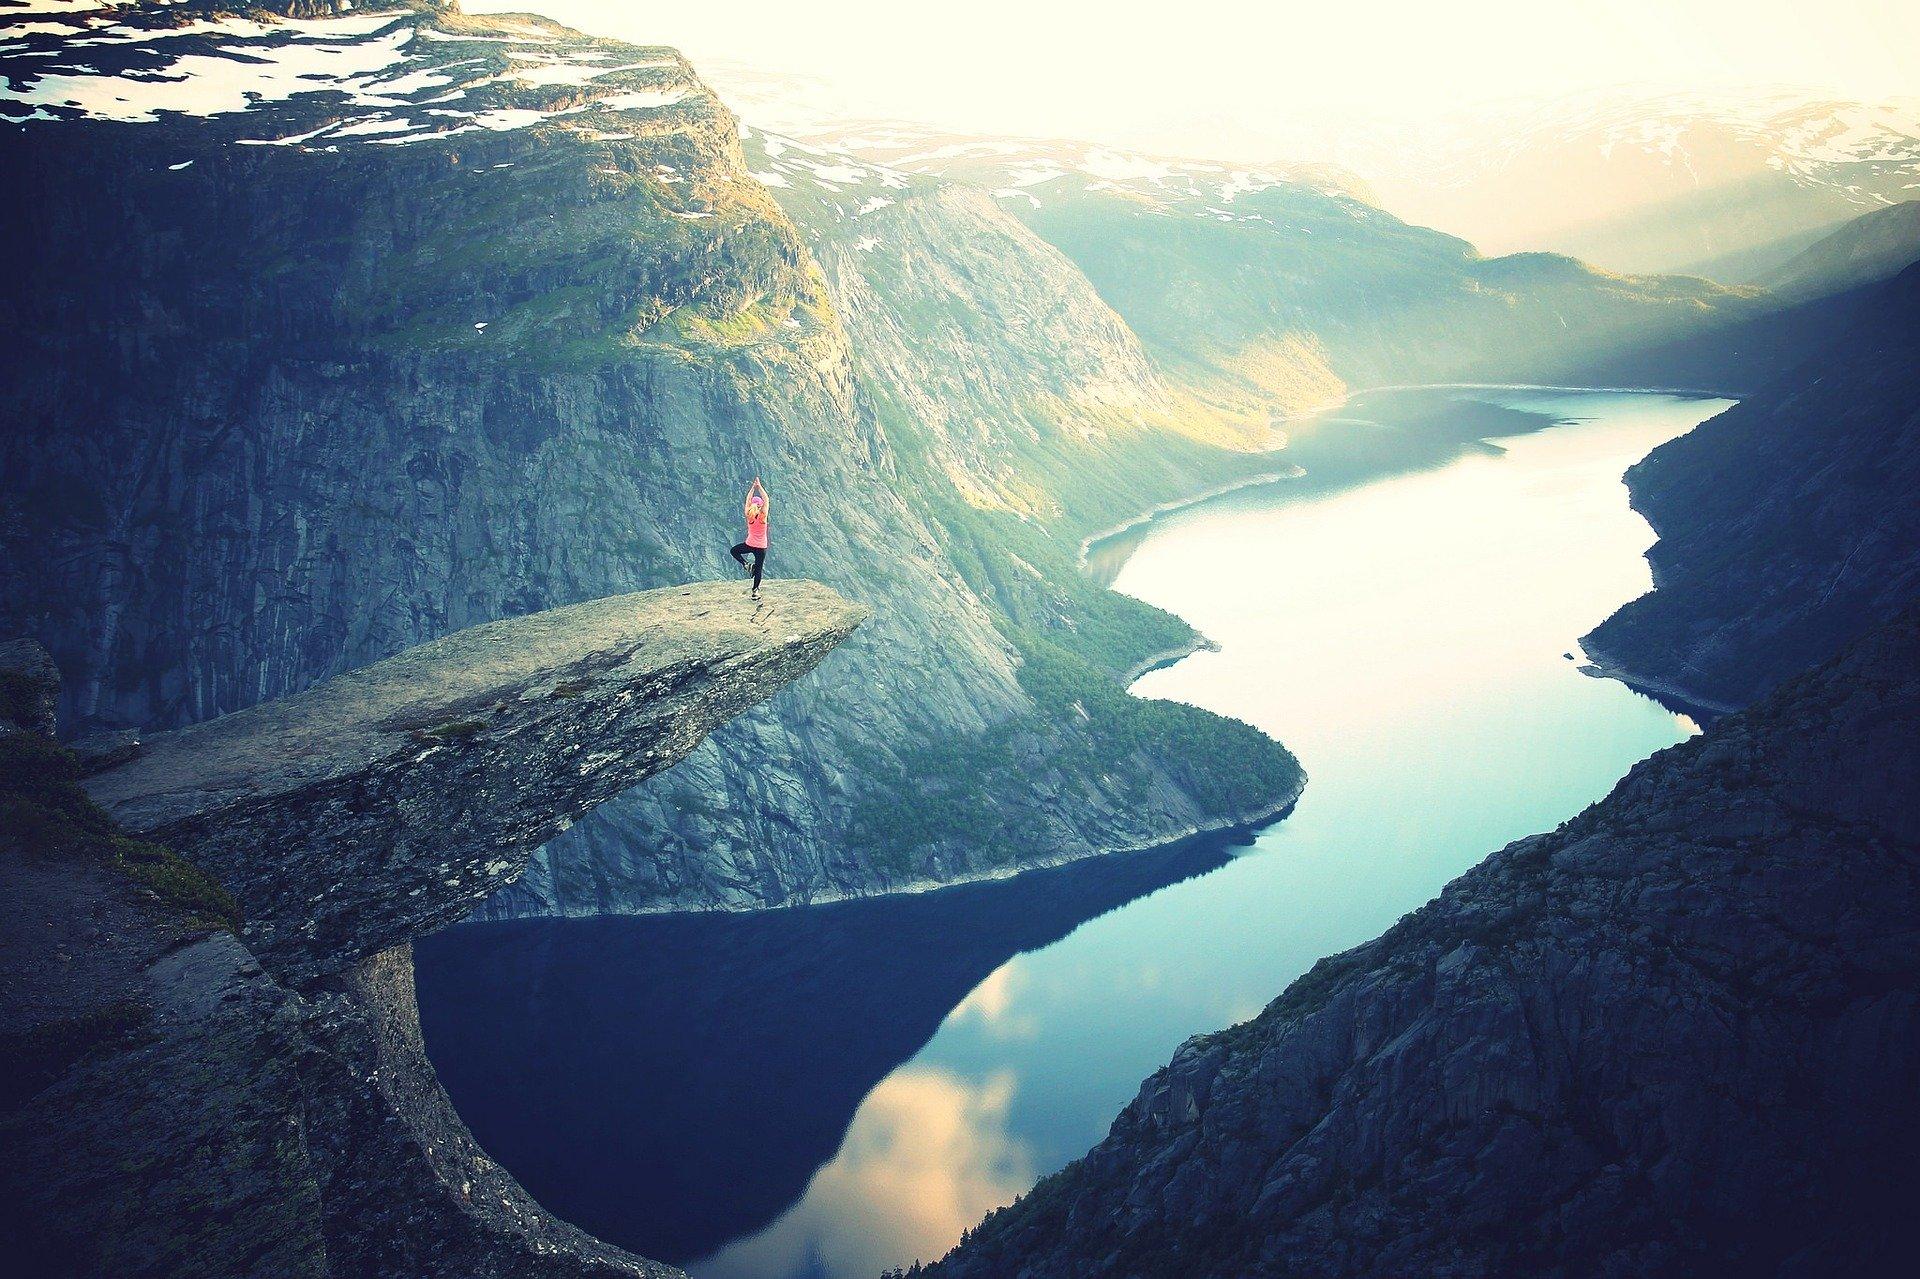 Sei mutig das befreit dich